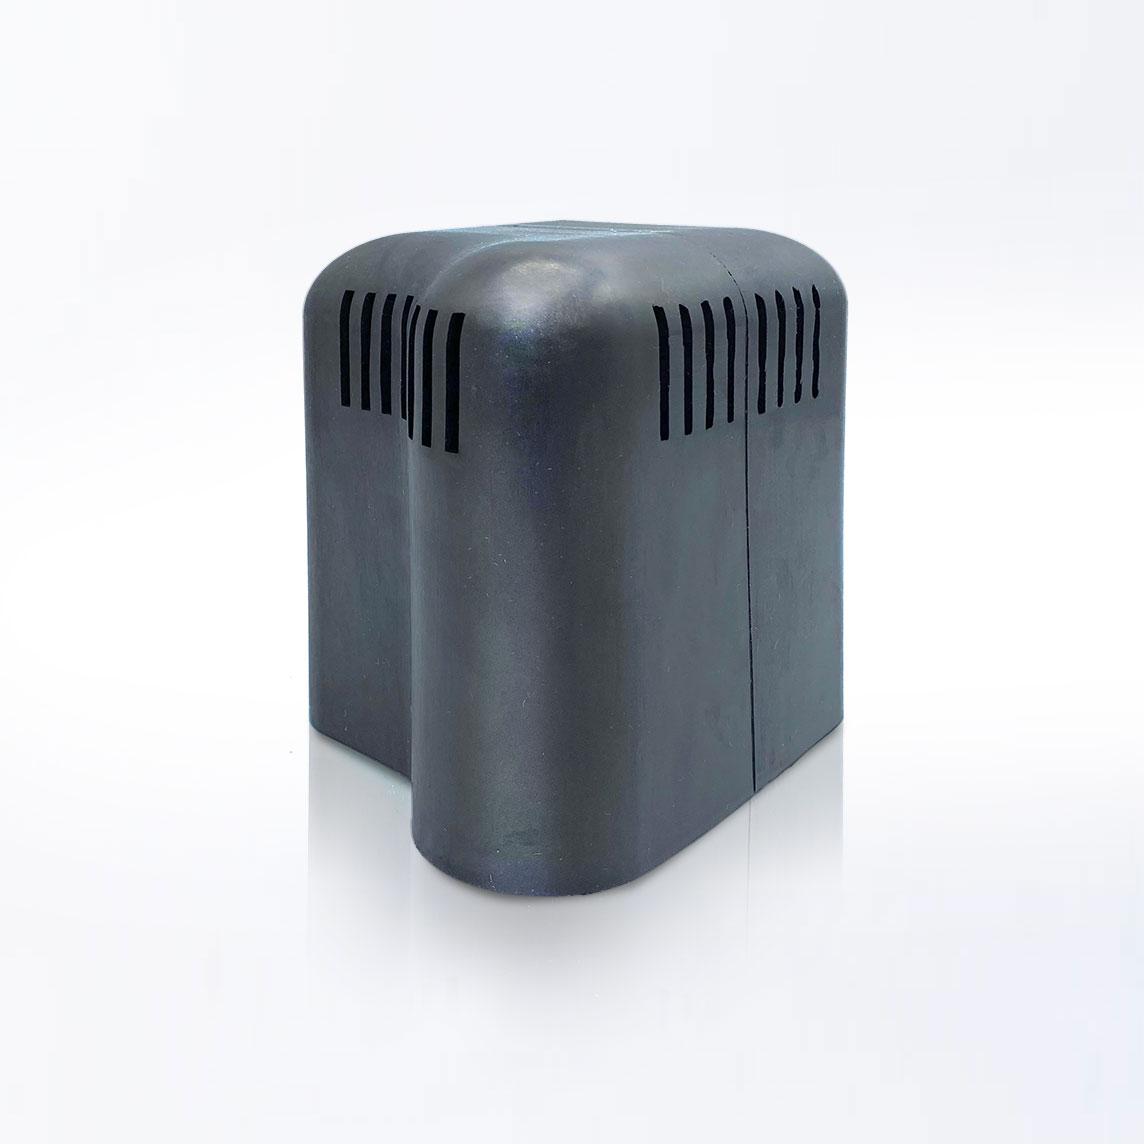 RONIN Rubber Motor Cover